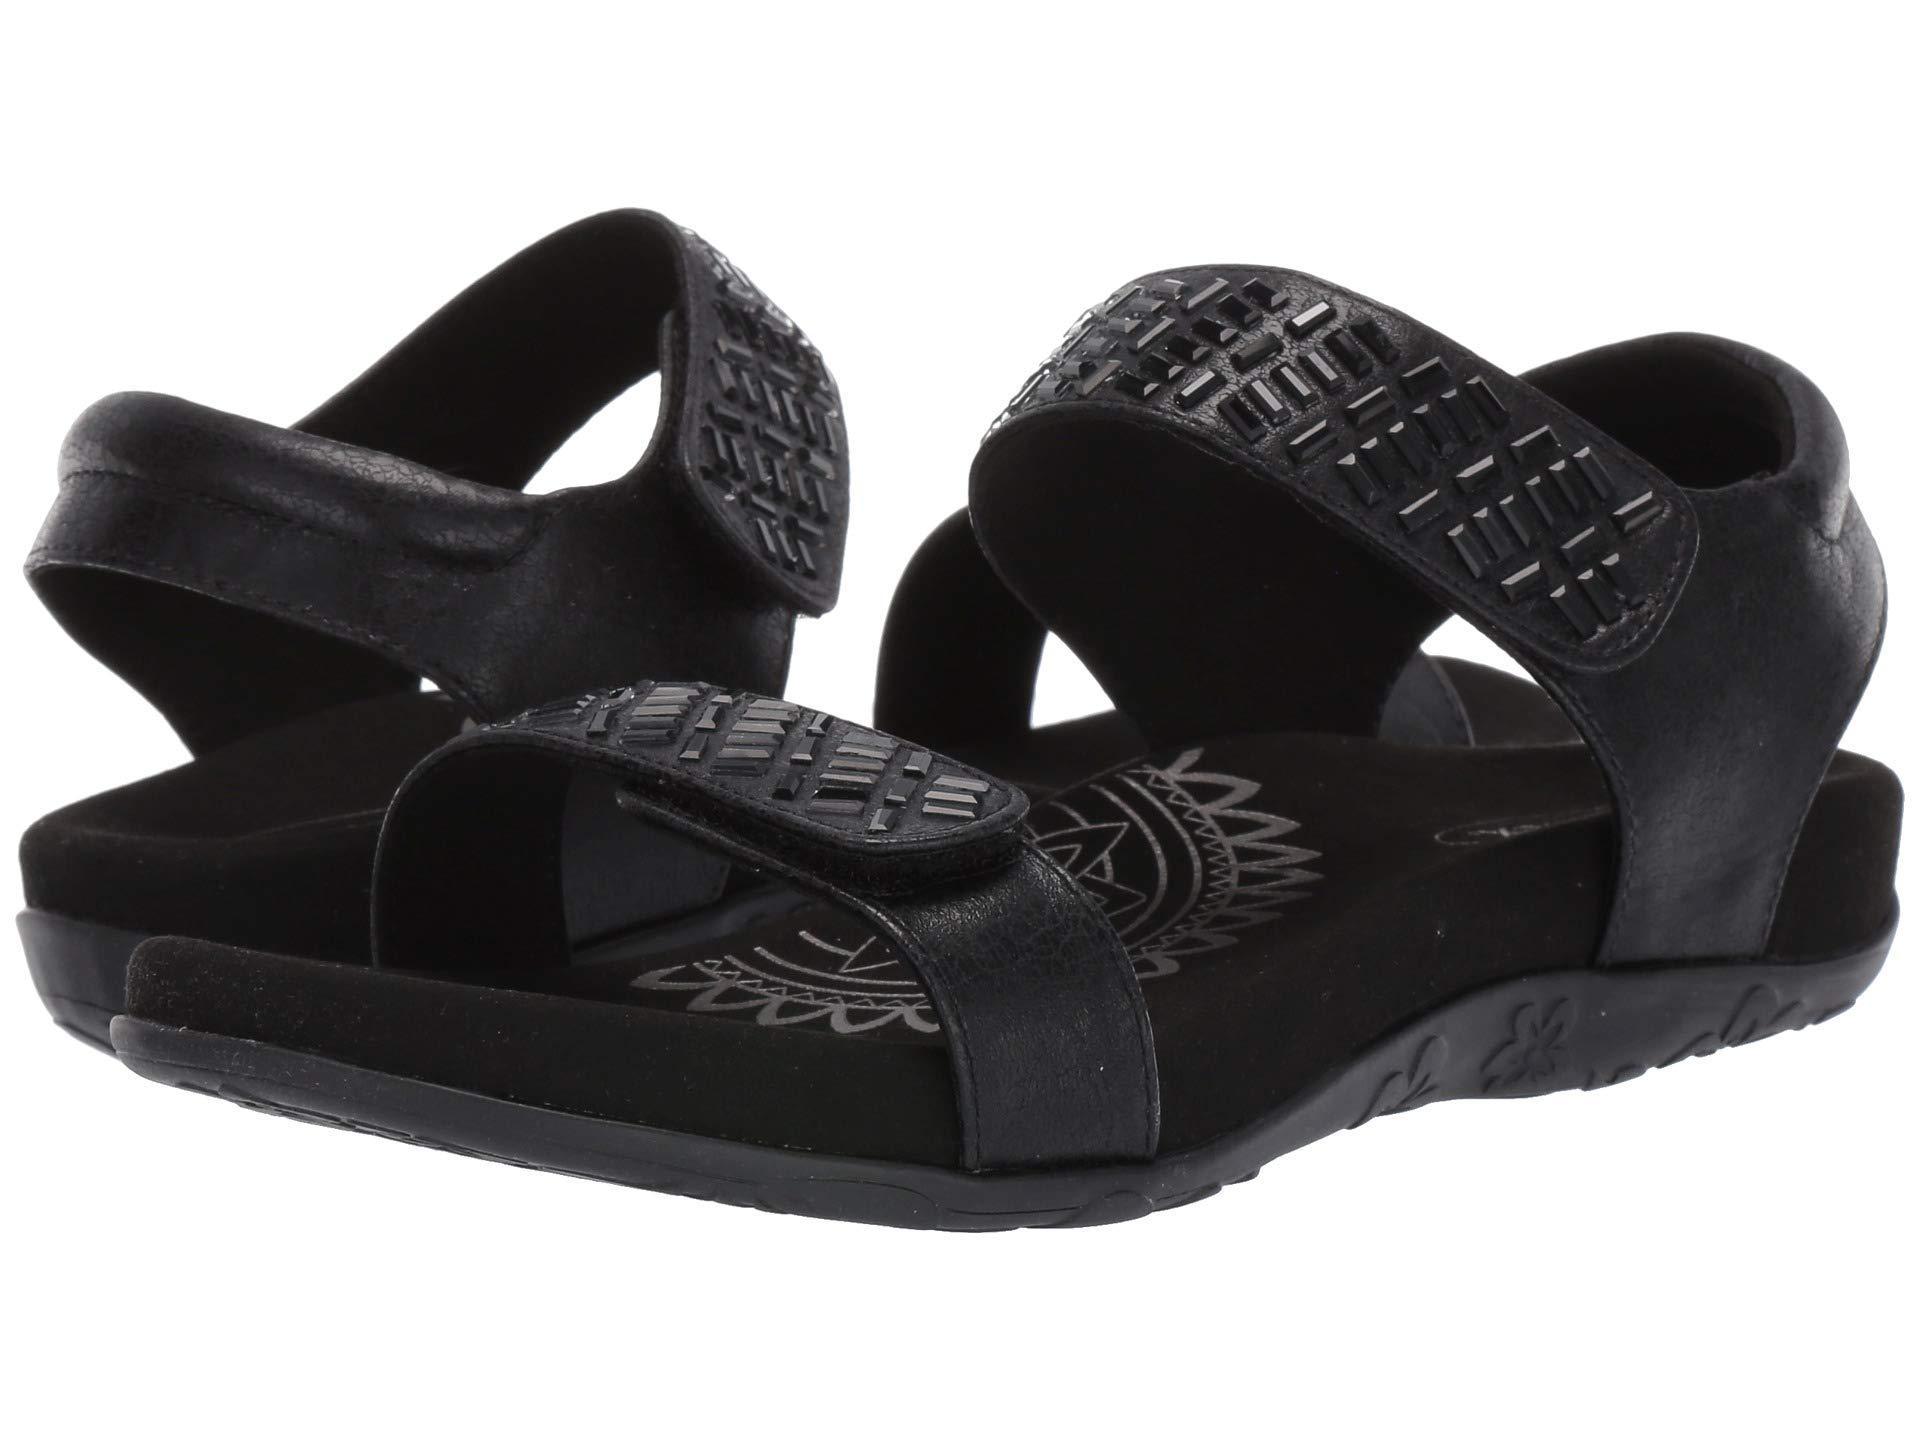 cdb9aed0ade Lyst - Aetrex Marcy (black) Women s Sandals in Black